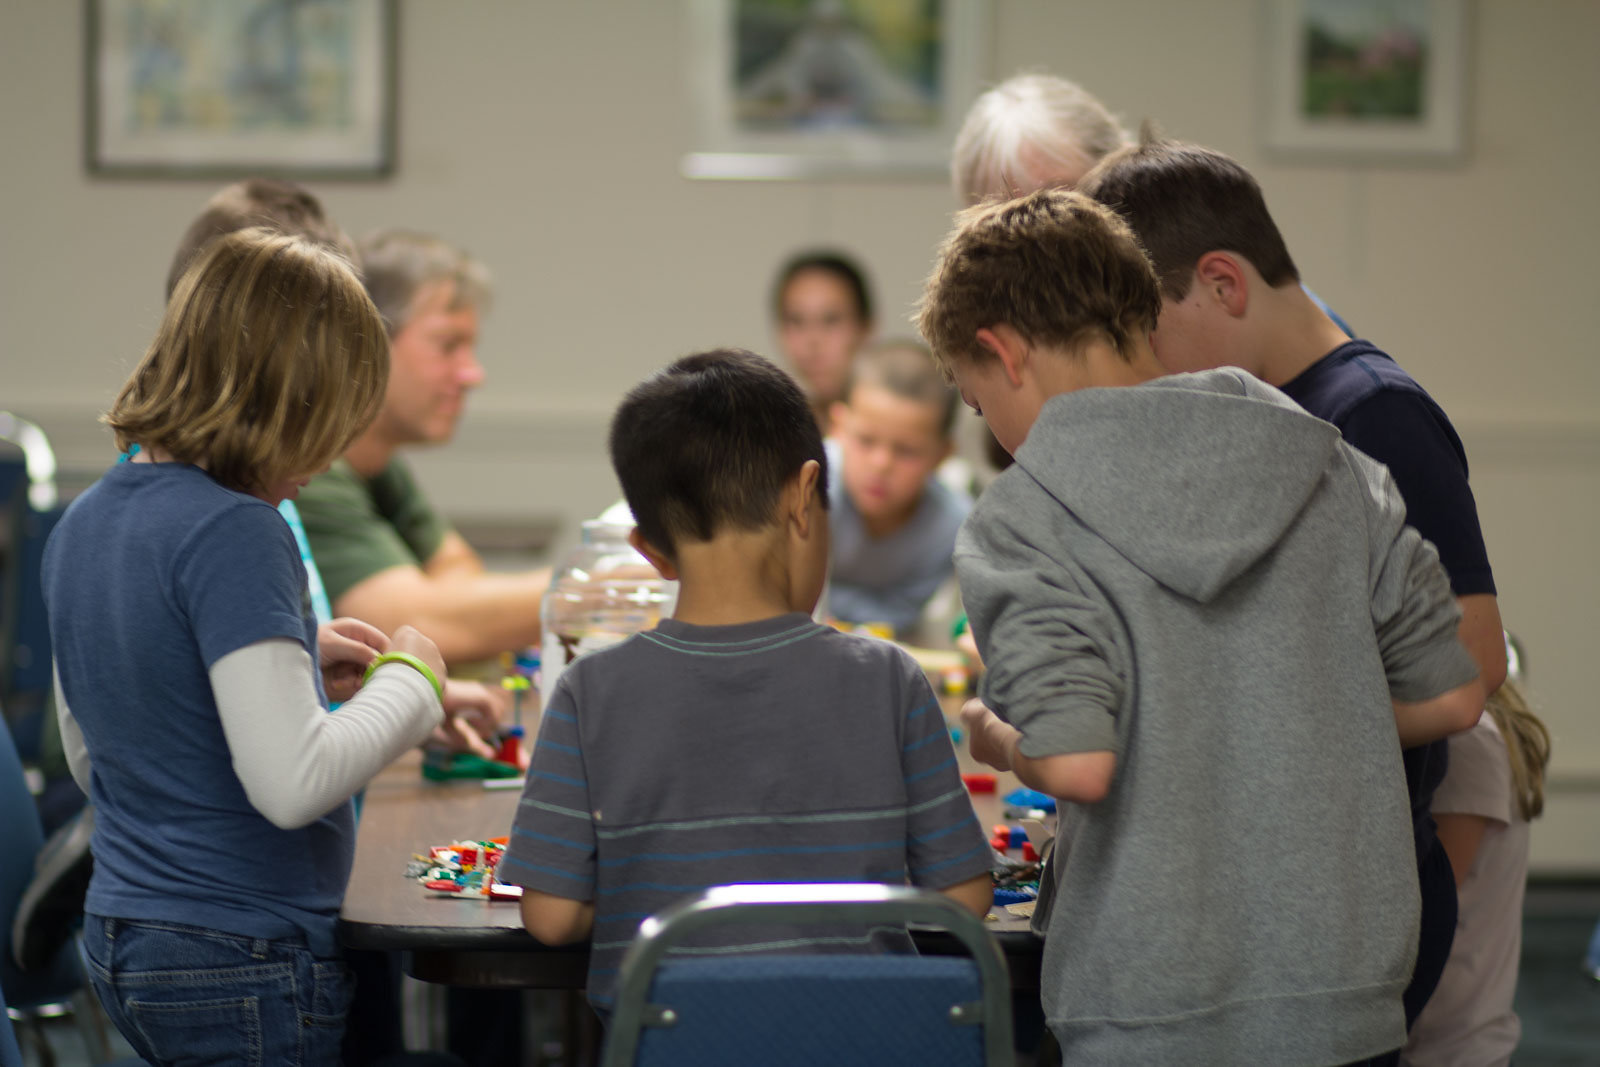 Rescheduled: LEGO Club & Crafts